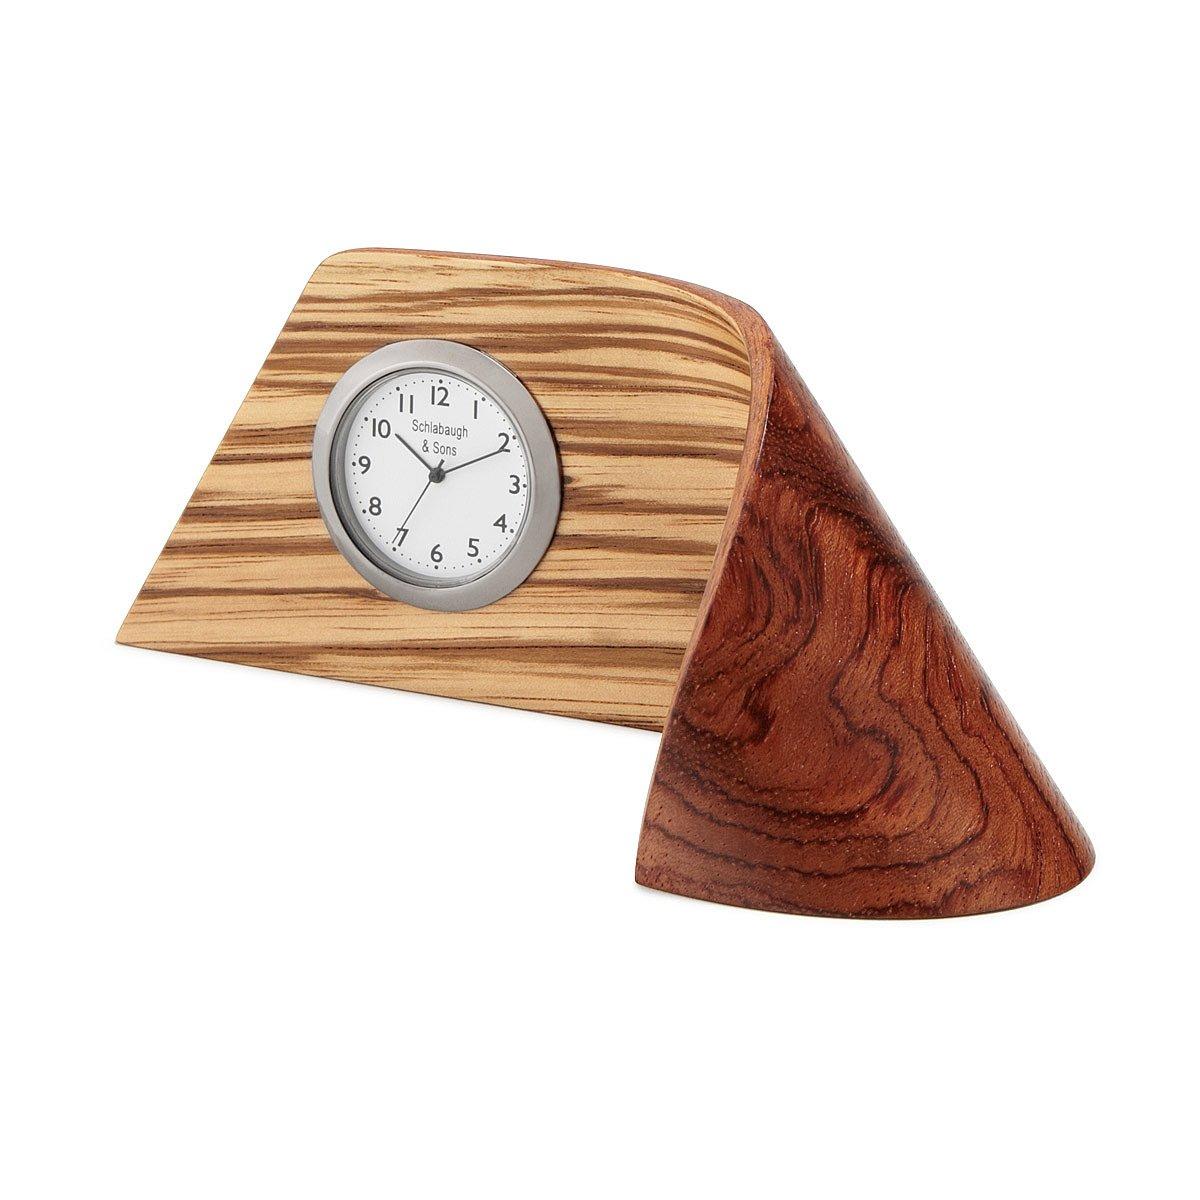 zebrawood ribbon clock  modern desk clock  uncommongoods - zebrawood ribbon clock  thumbnail